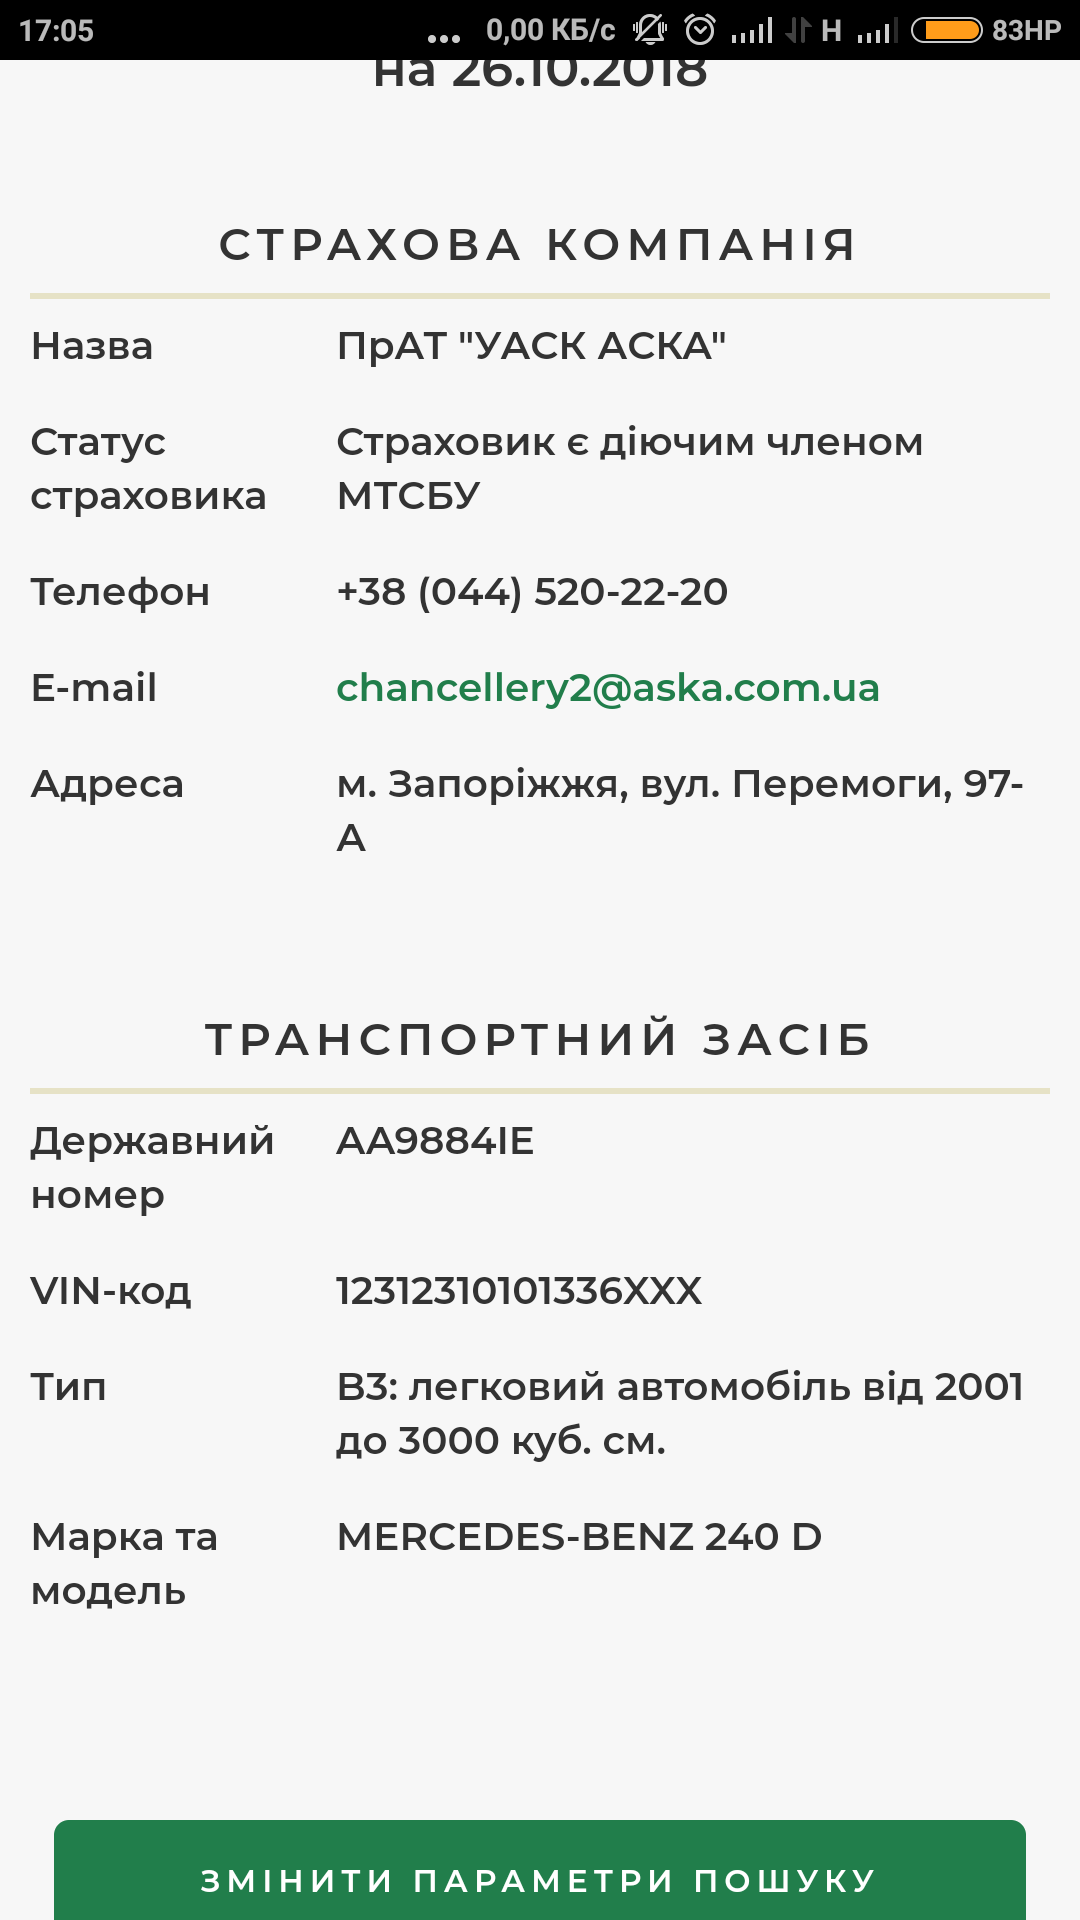 image http://forum.setam.net.ua/assets/images/517-uz3cC8GMJfxlDhcI.png